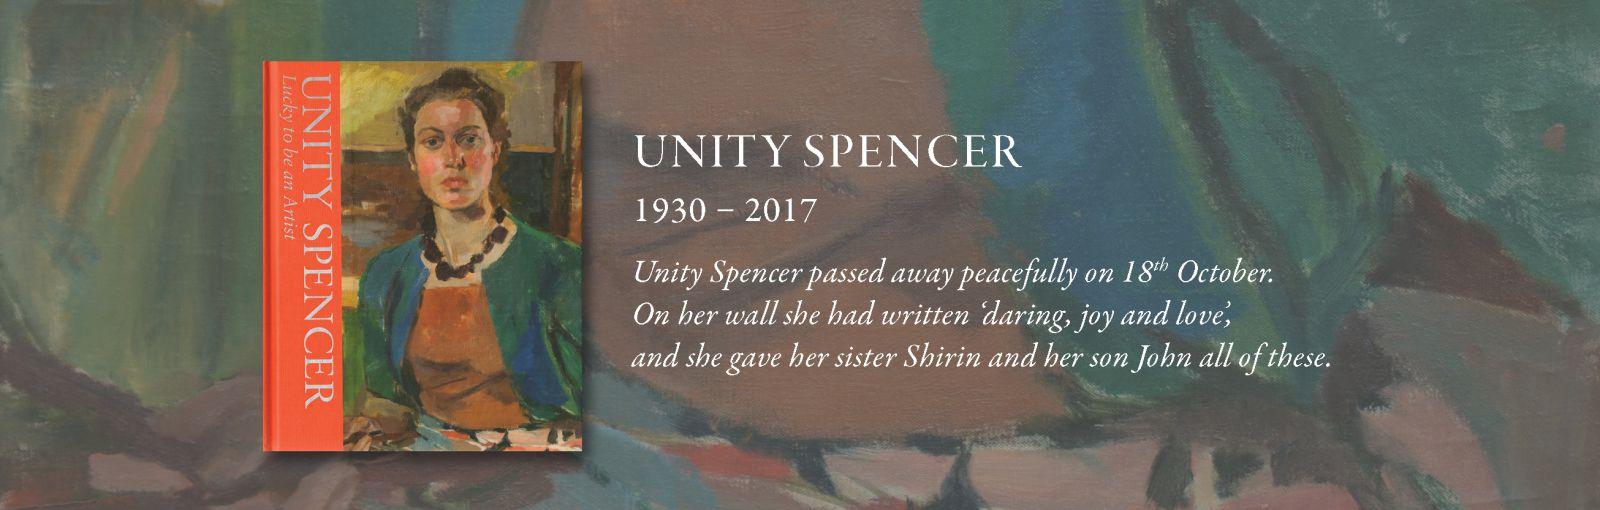 Unity Spencer